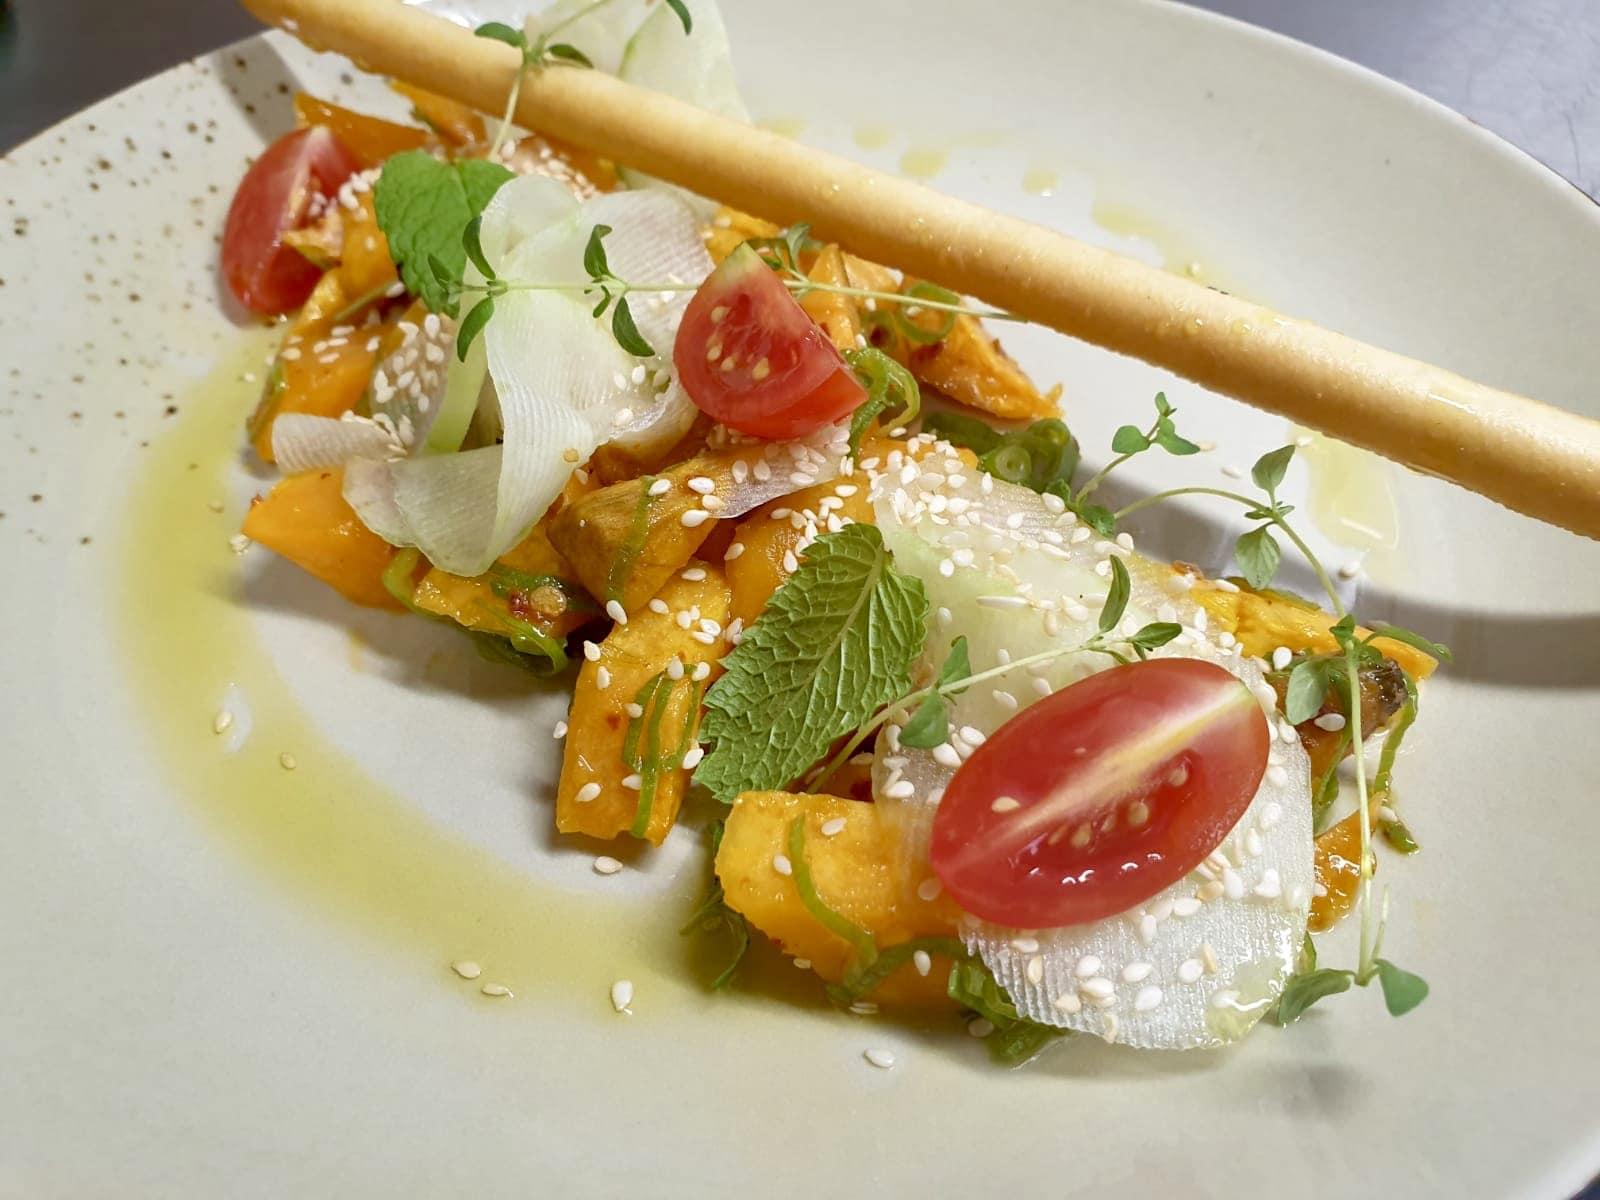 Süßkartoffelsalat mit Tomate, Sesam & Grissini, vegan (c) Suppenglück